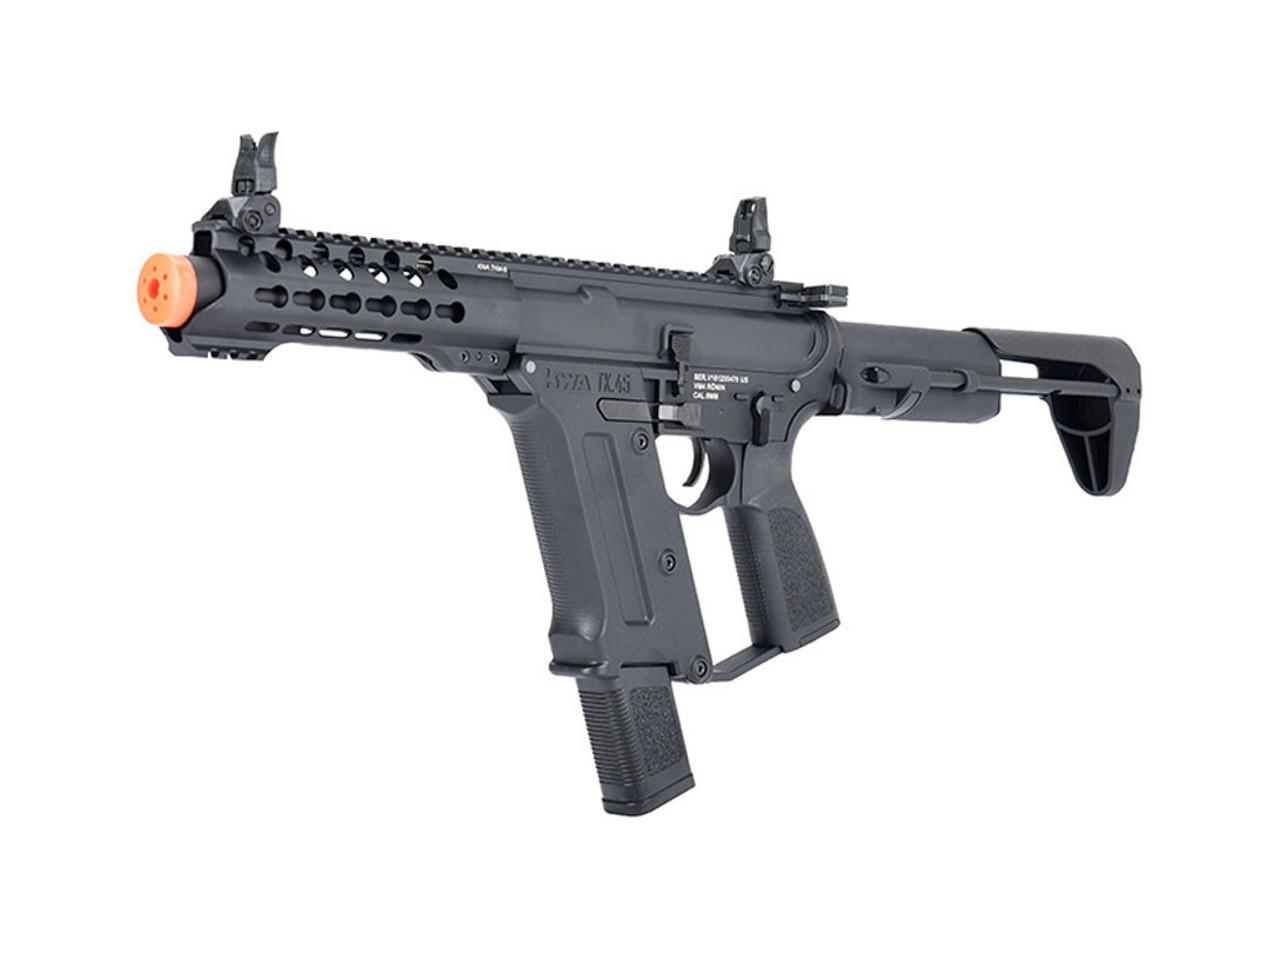 ramasser d7359 81dcc KWA TK45C Adjustable FPS Airsoft Gun